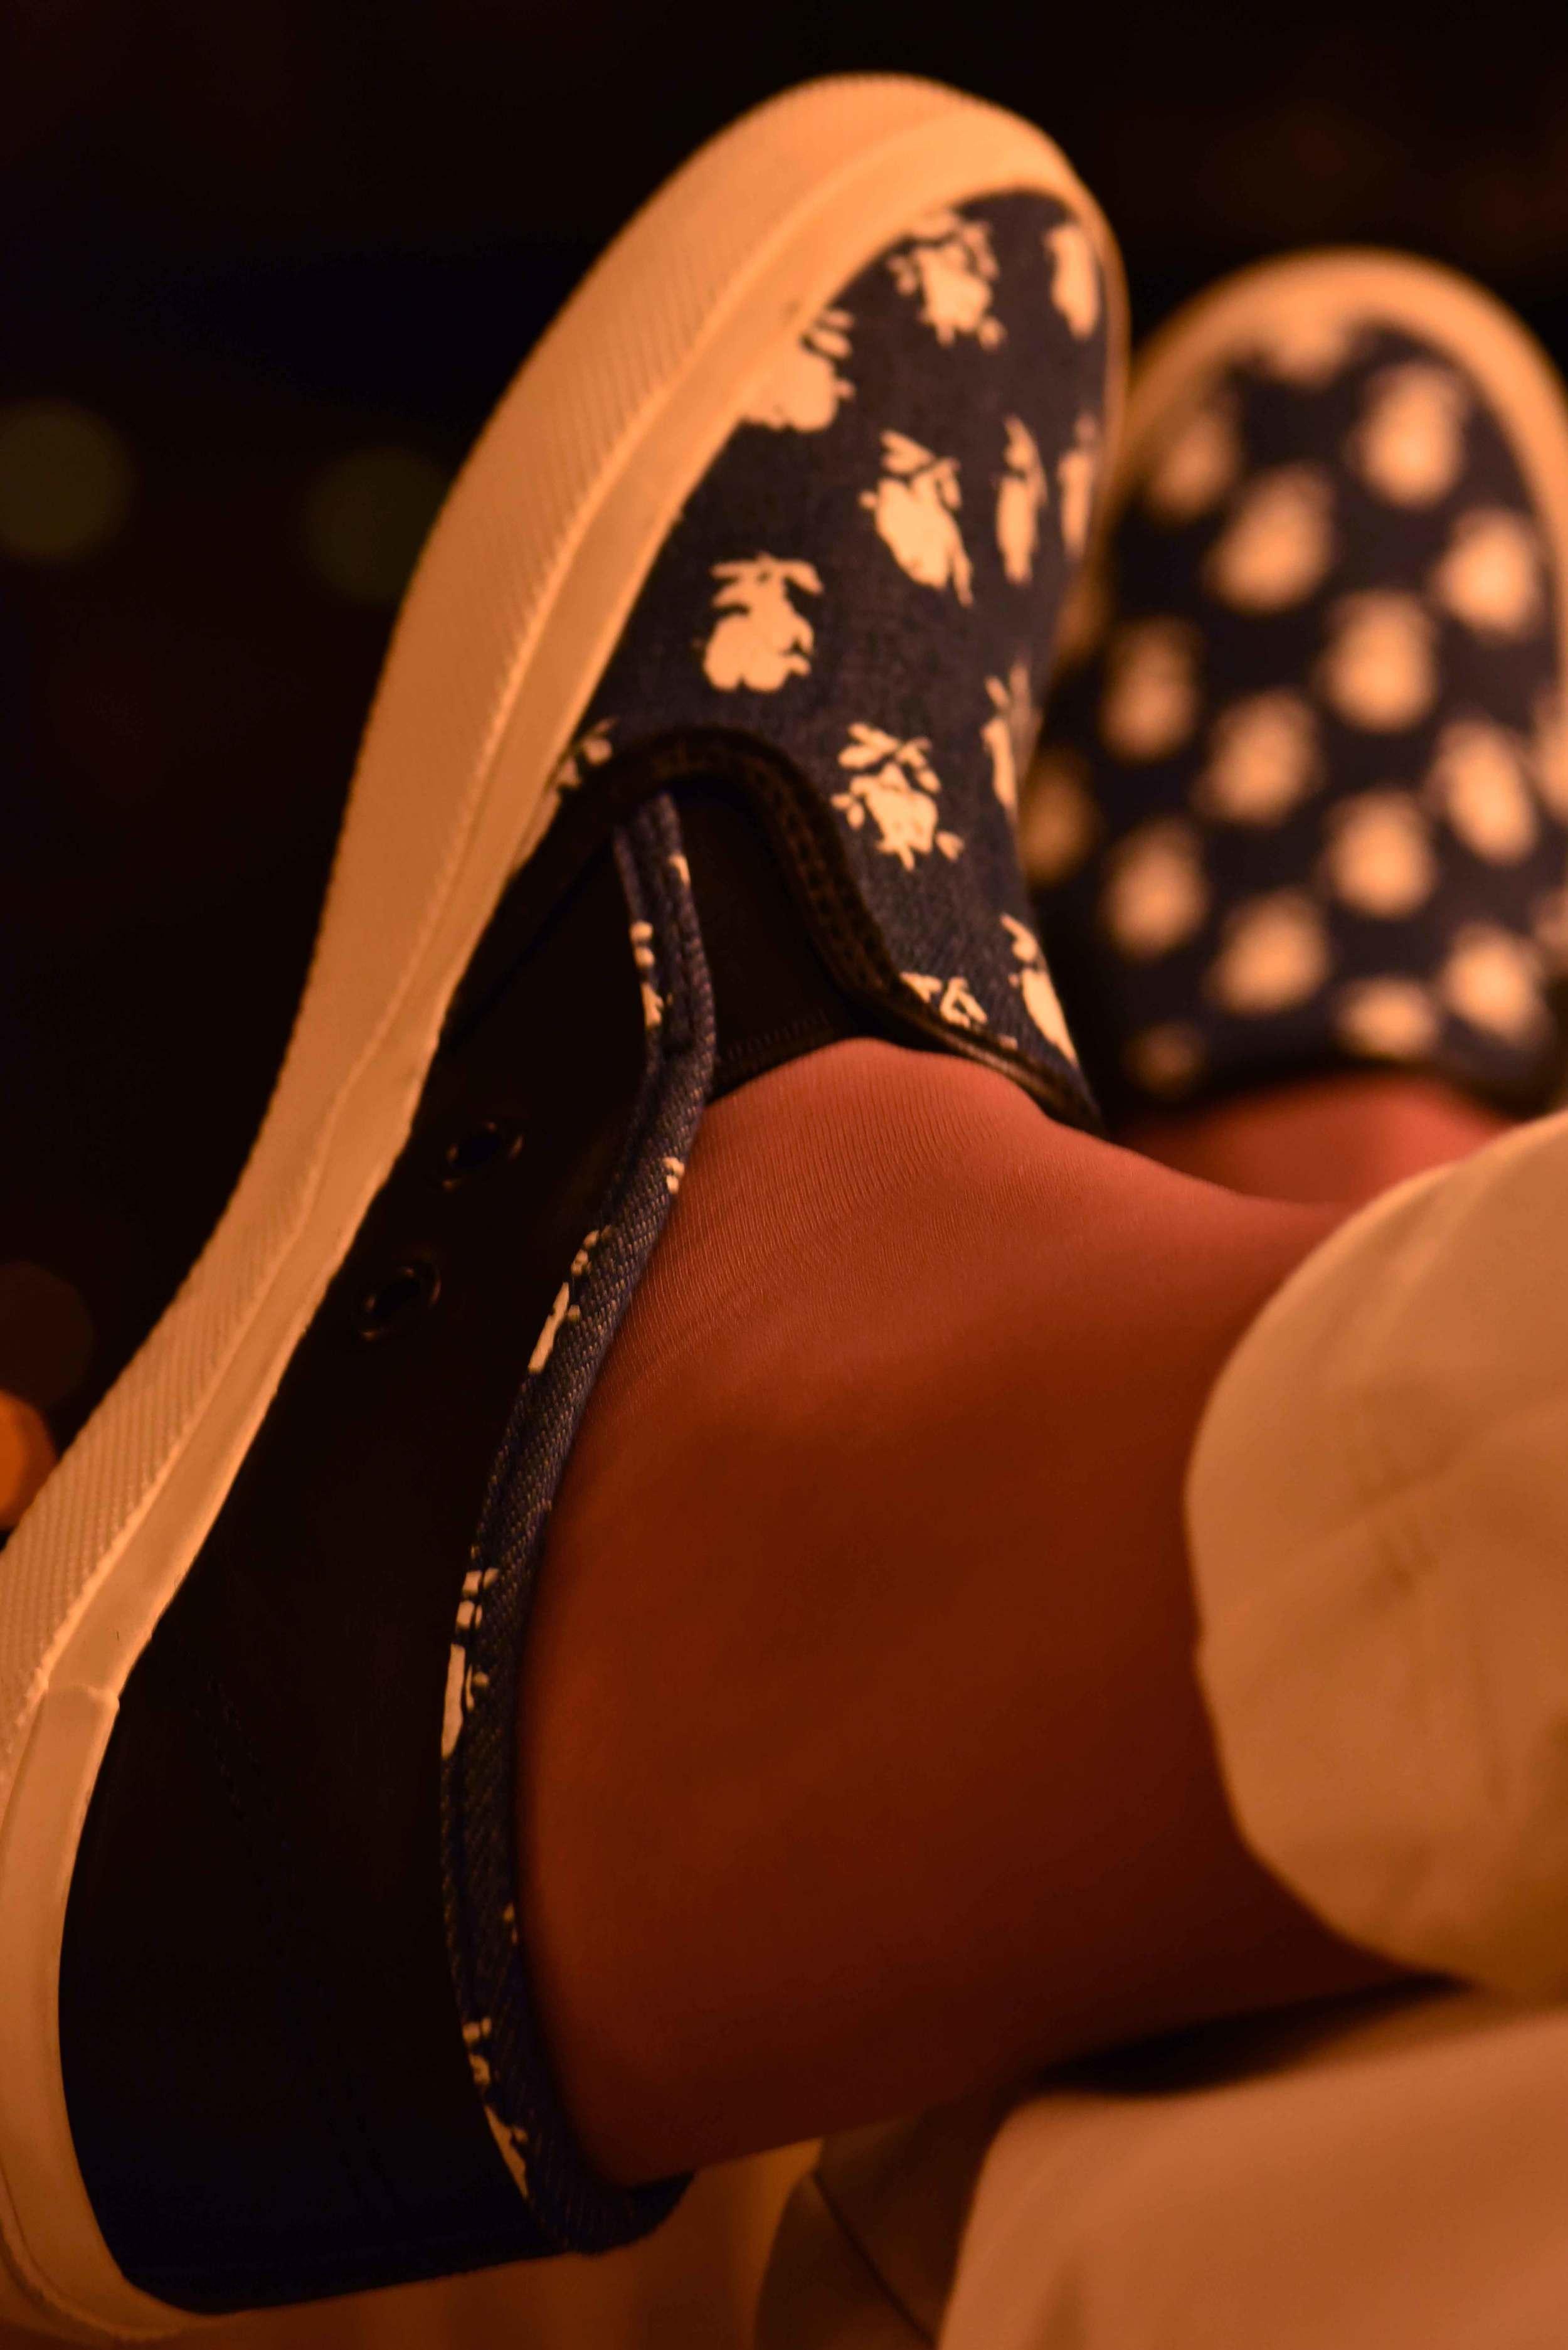 Coach shoes, image©gunjanvirk